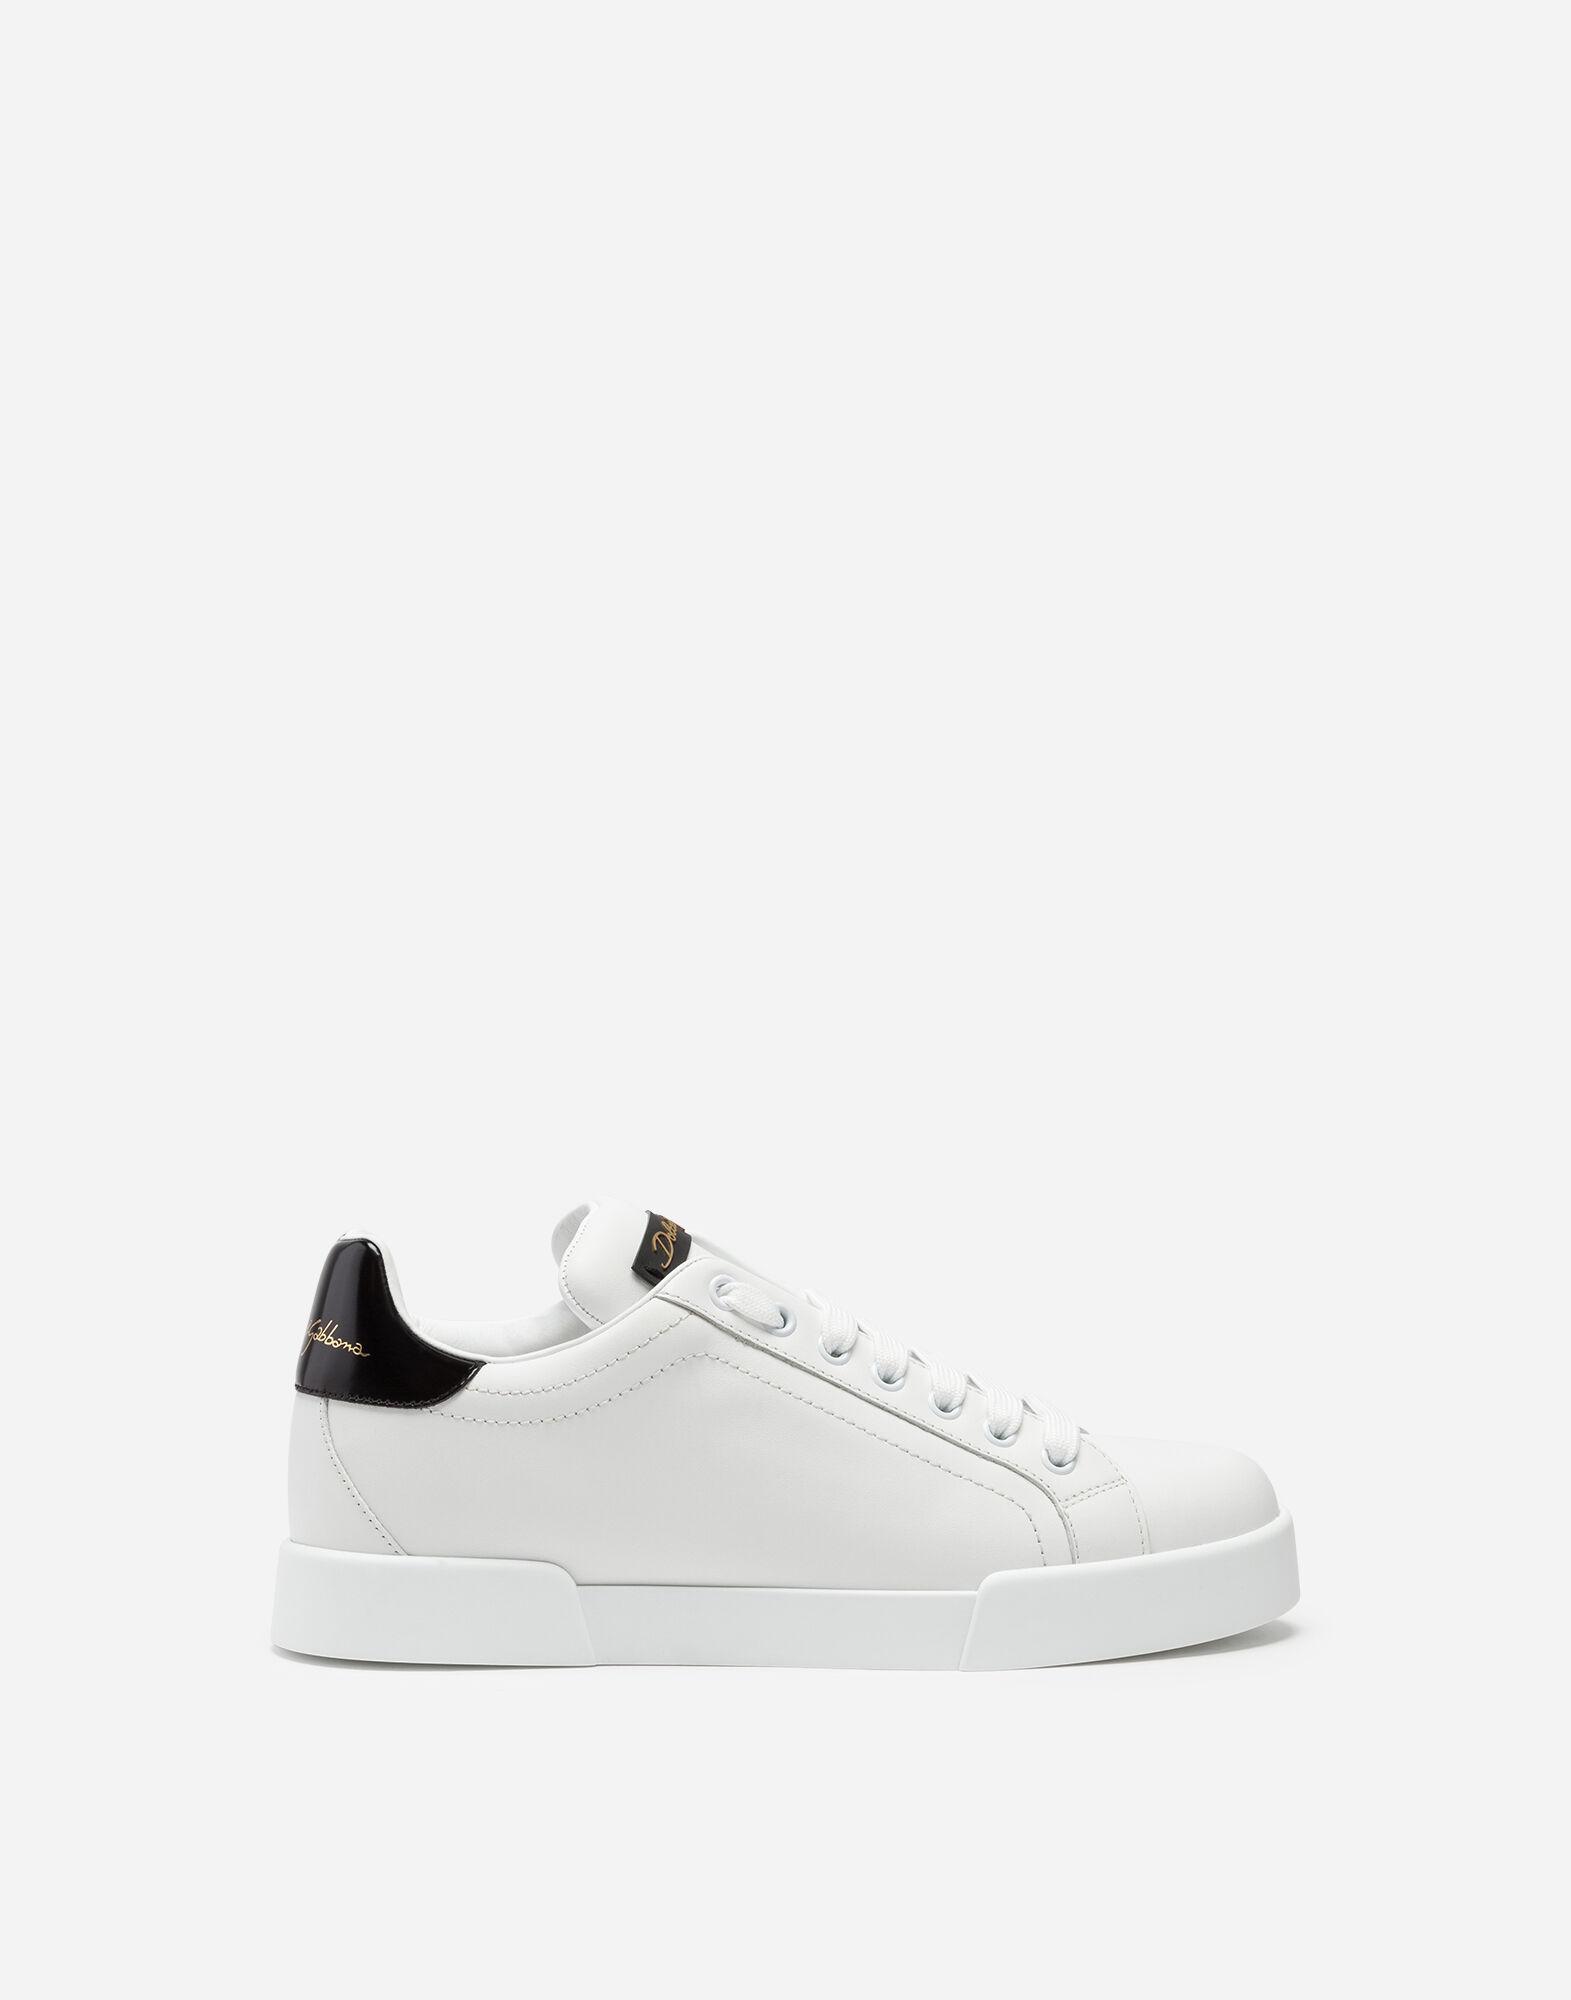 amp;gabbana Pour Sneakers amp;gabbana Pour FemmeDolce amp;gabbana Sneakers FemmeDolce Sneakers Pour FemmeDolce ZiXkuP